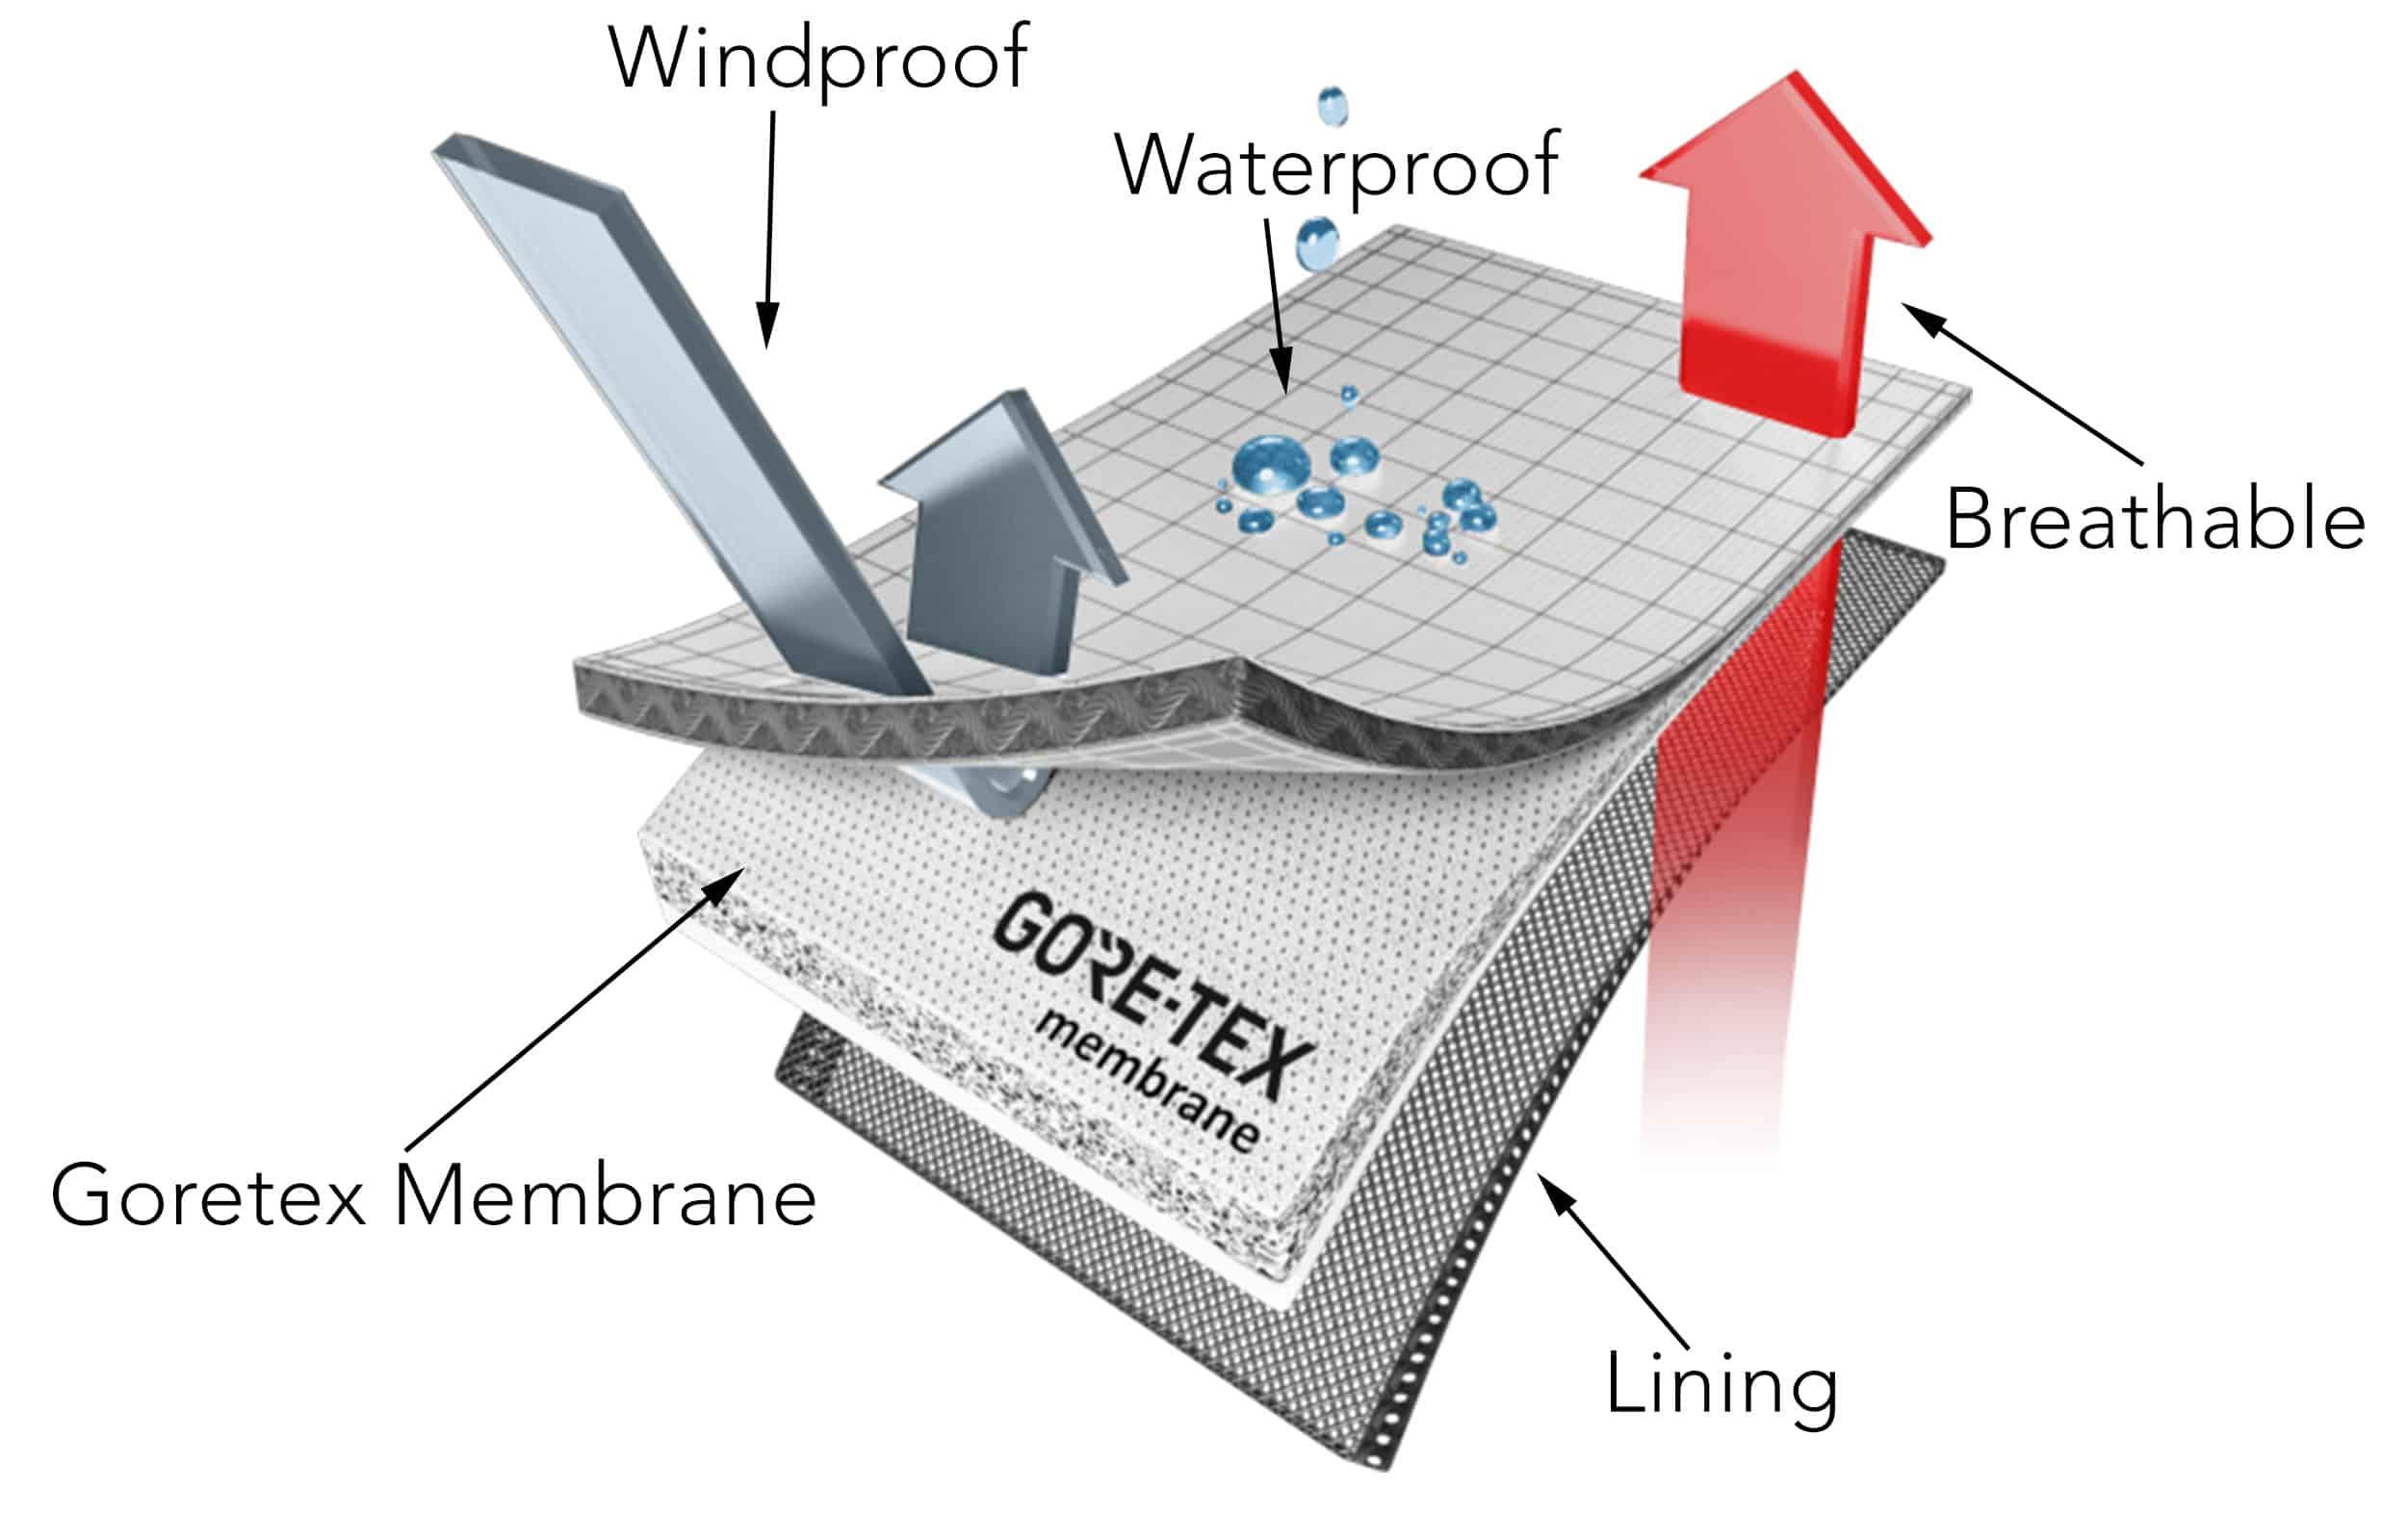 goretex waterproof technology